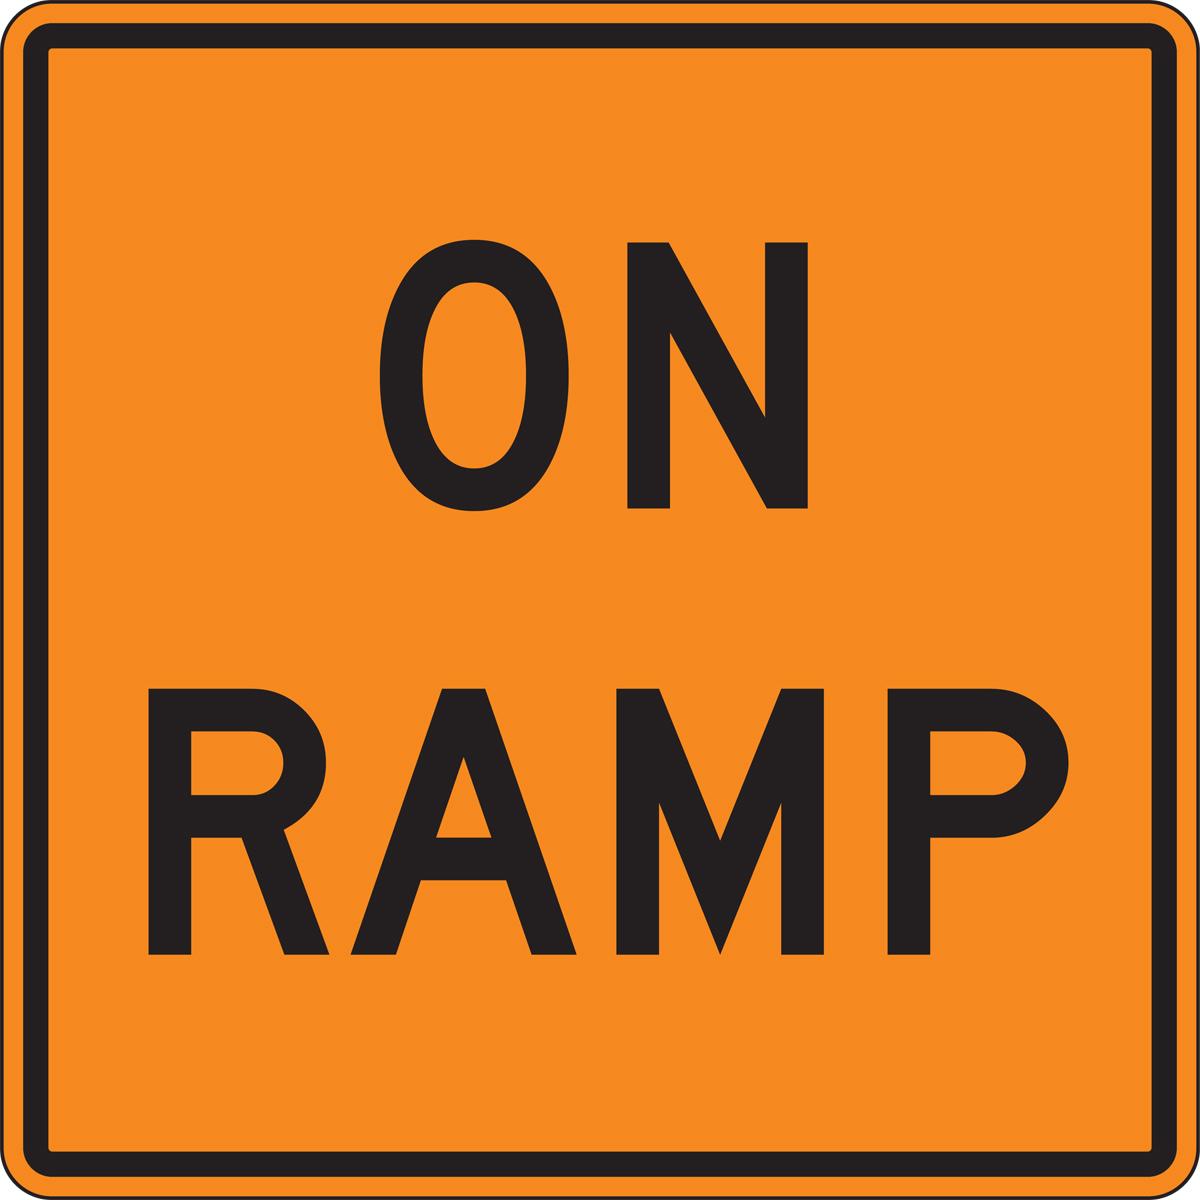 ON RAMP